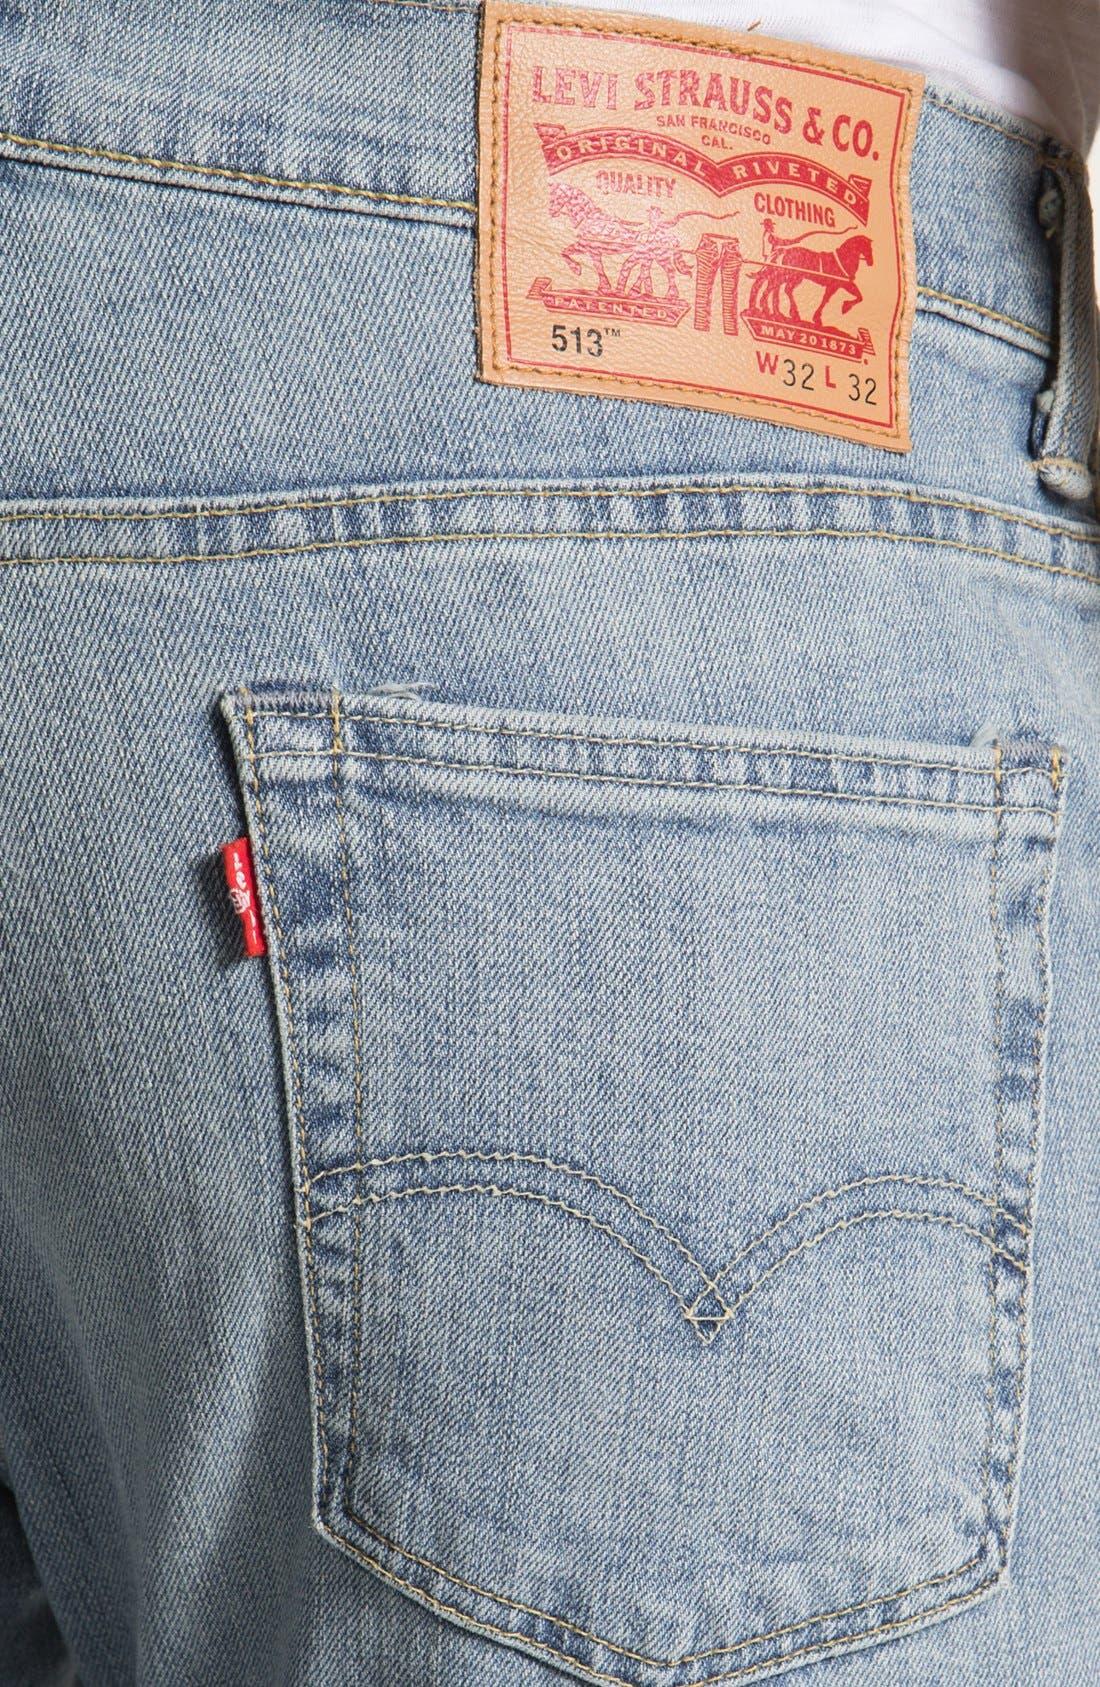 Alternate Image 4  - Levi's® '513™' Slim Fit Jeans (Light Breeze)